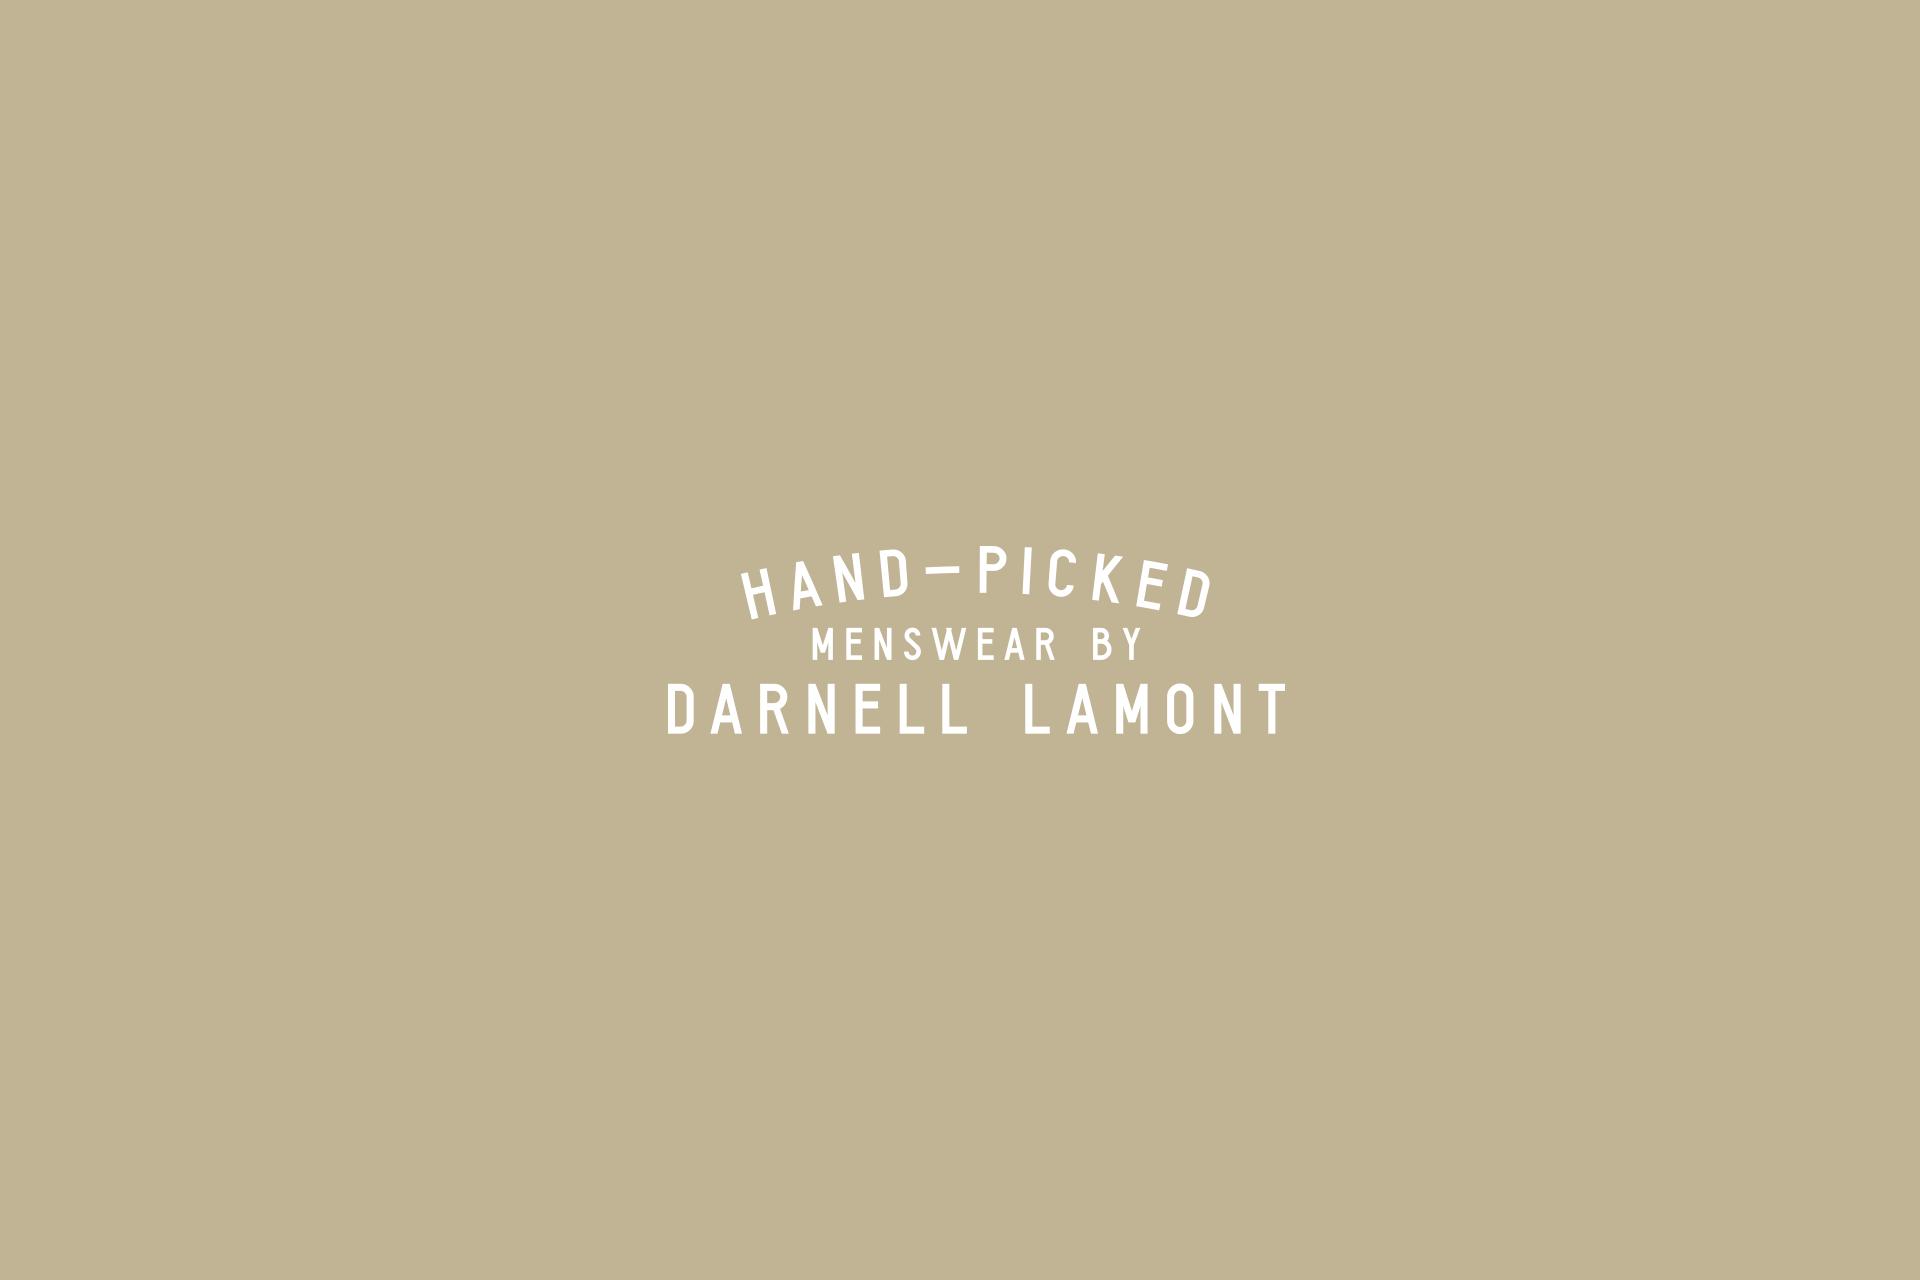 HPMWDL-Logo-Darnell-Lamont_02.png